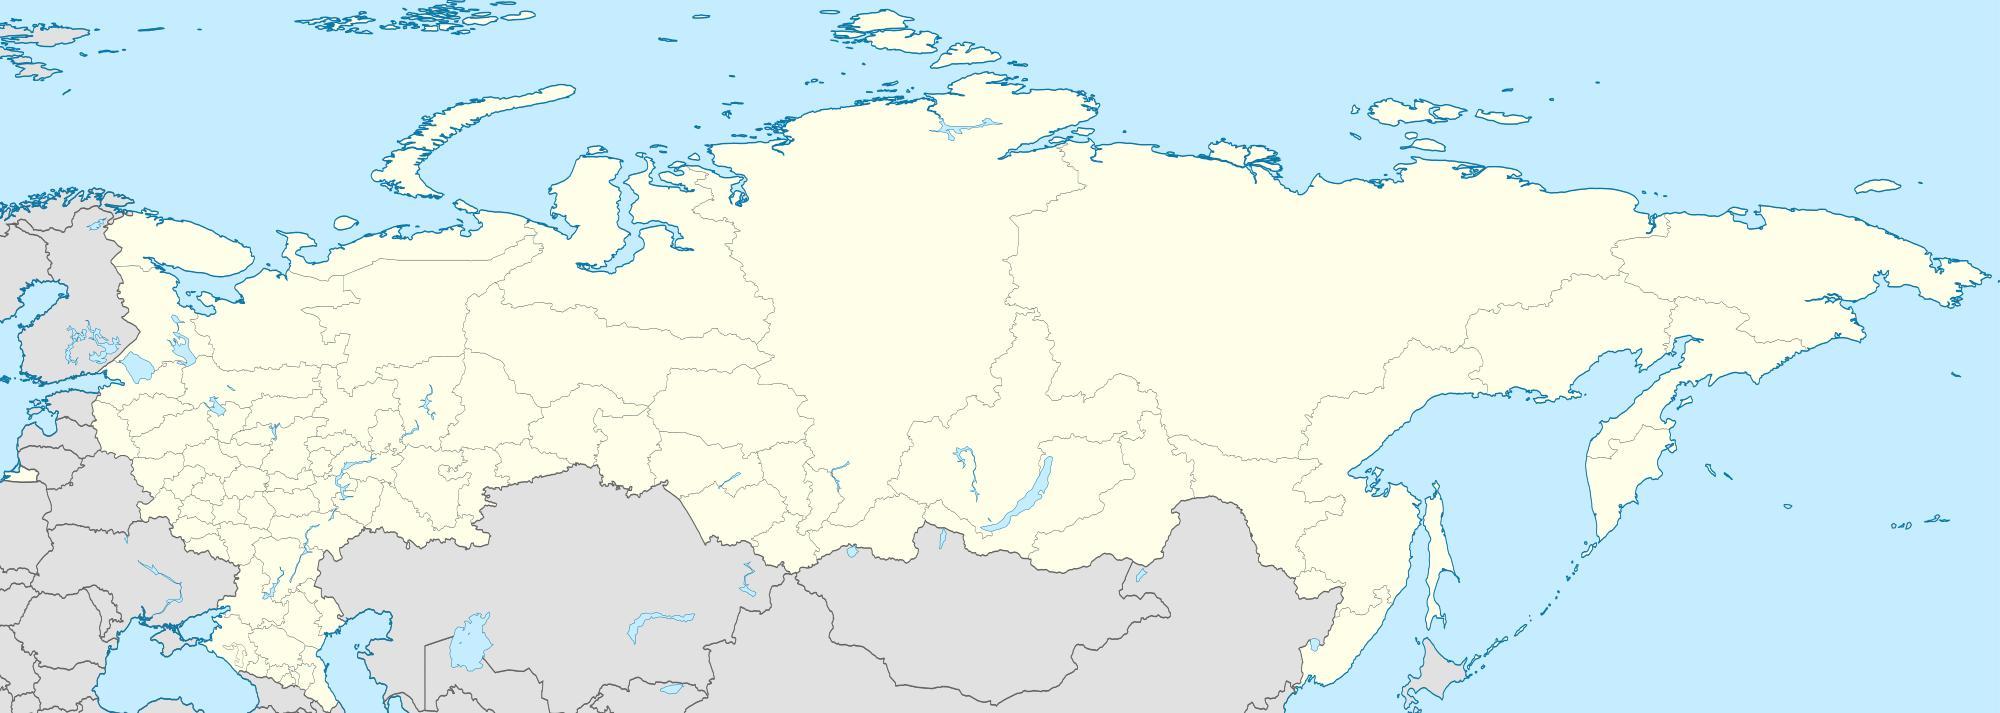 Venaja Kartta Wikipedia Kartta Venajan Wikipedia Ita Eurooppa